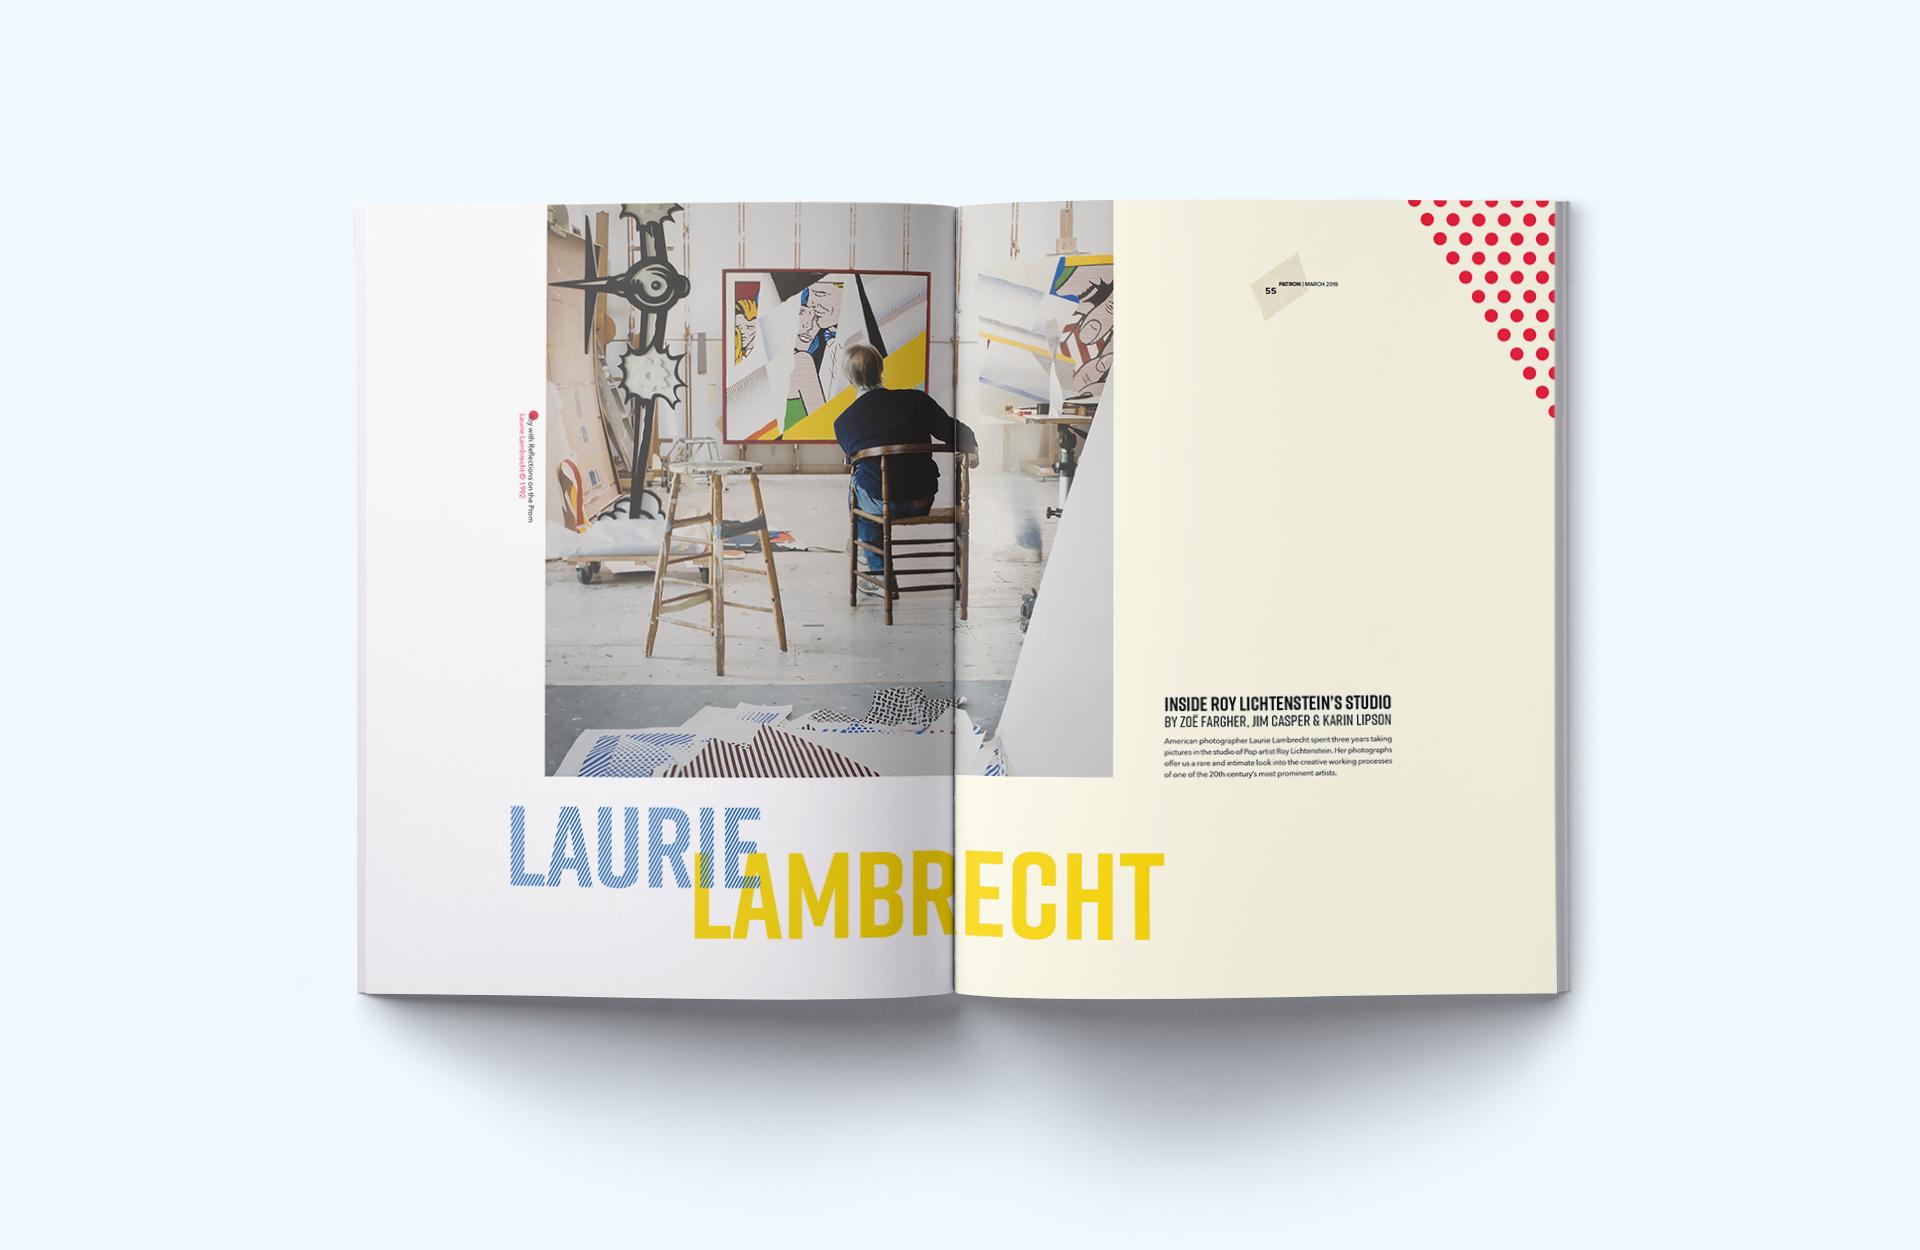 LAURIE LAMBRECHT: INSIDE ROY LICHTENSTEIN'S STUDIO